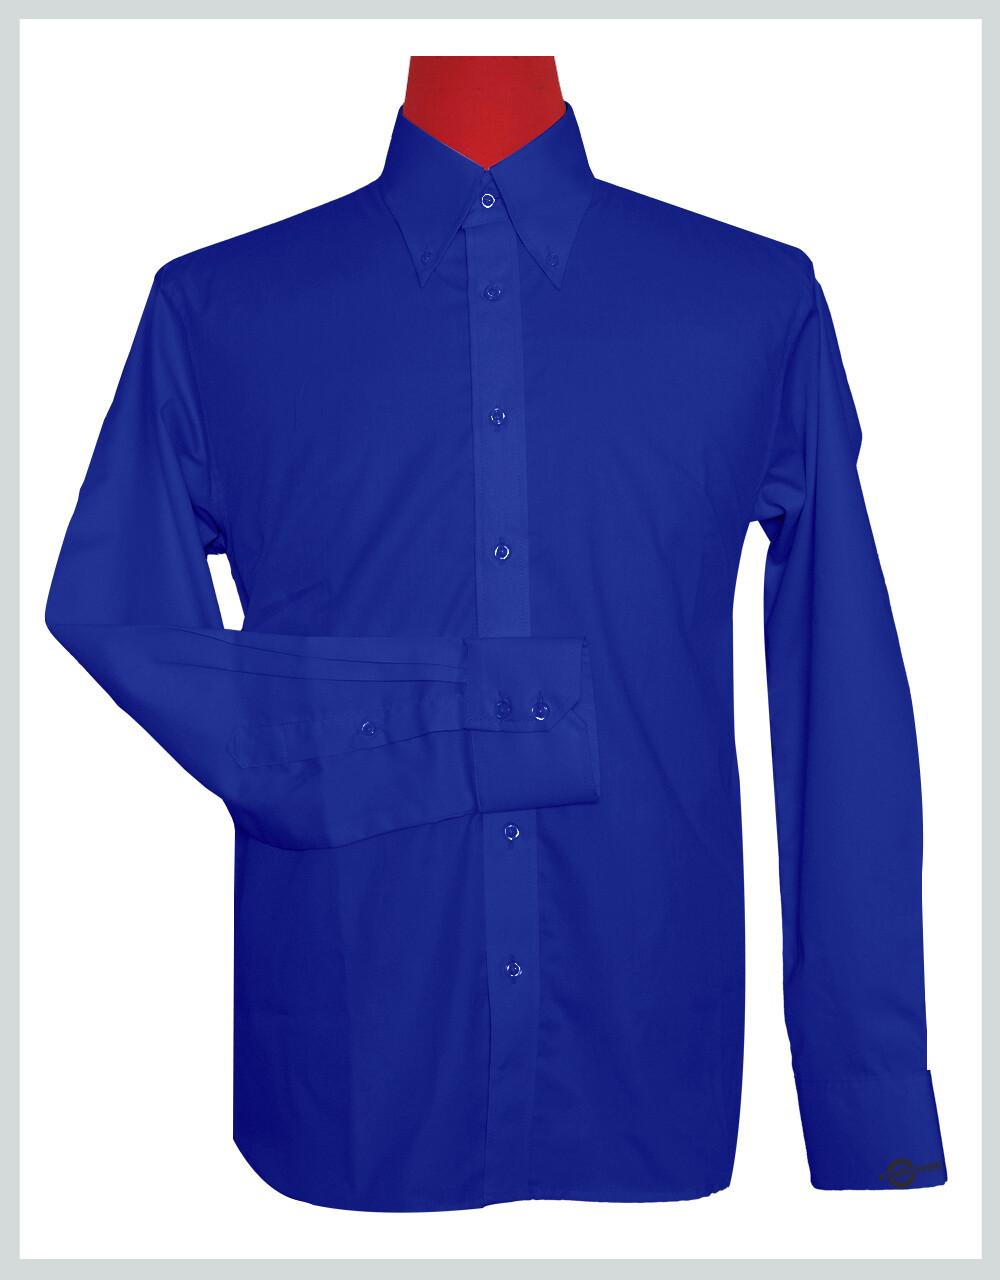 Button-Down Collar Shirt   Blue Color Shirt For Man